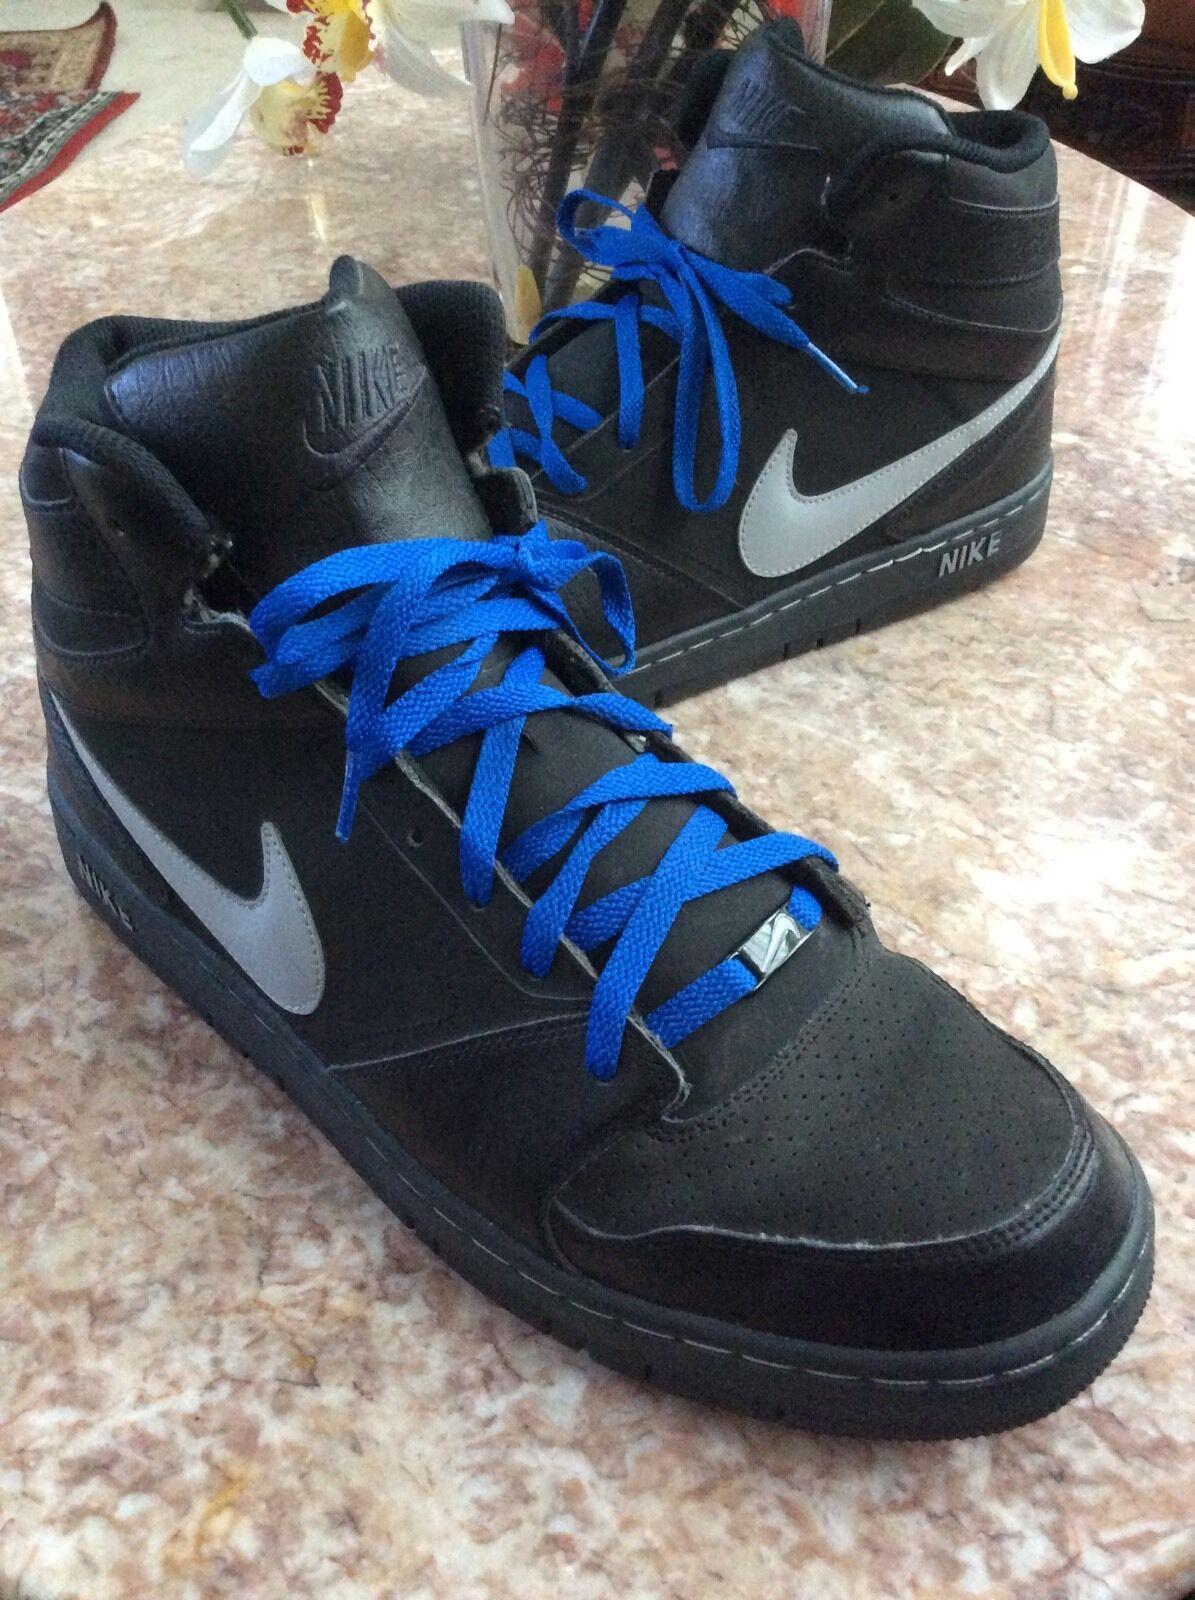 Nike Size Prestige IV High Nero Pelle Casual Athletic  Size Nike 14 584614-004 a95485